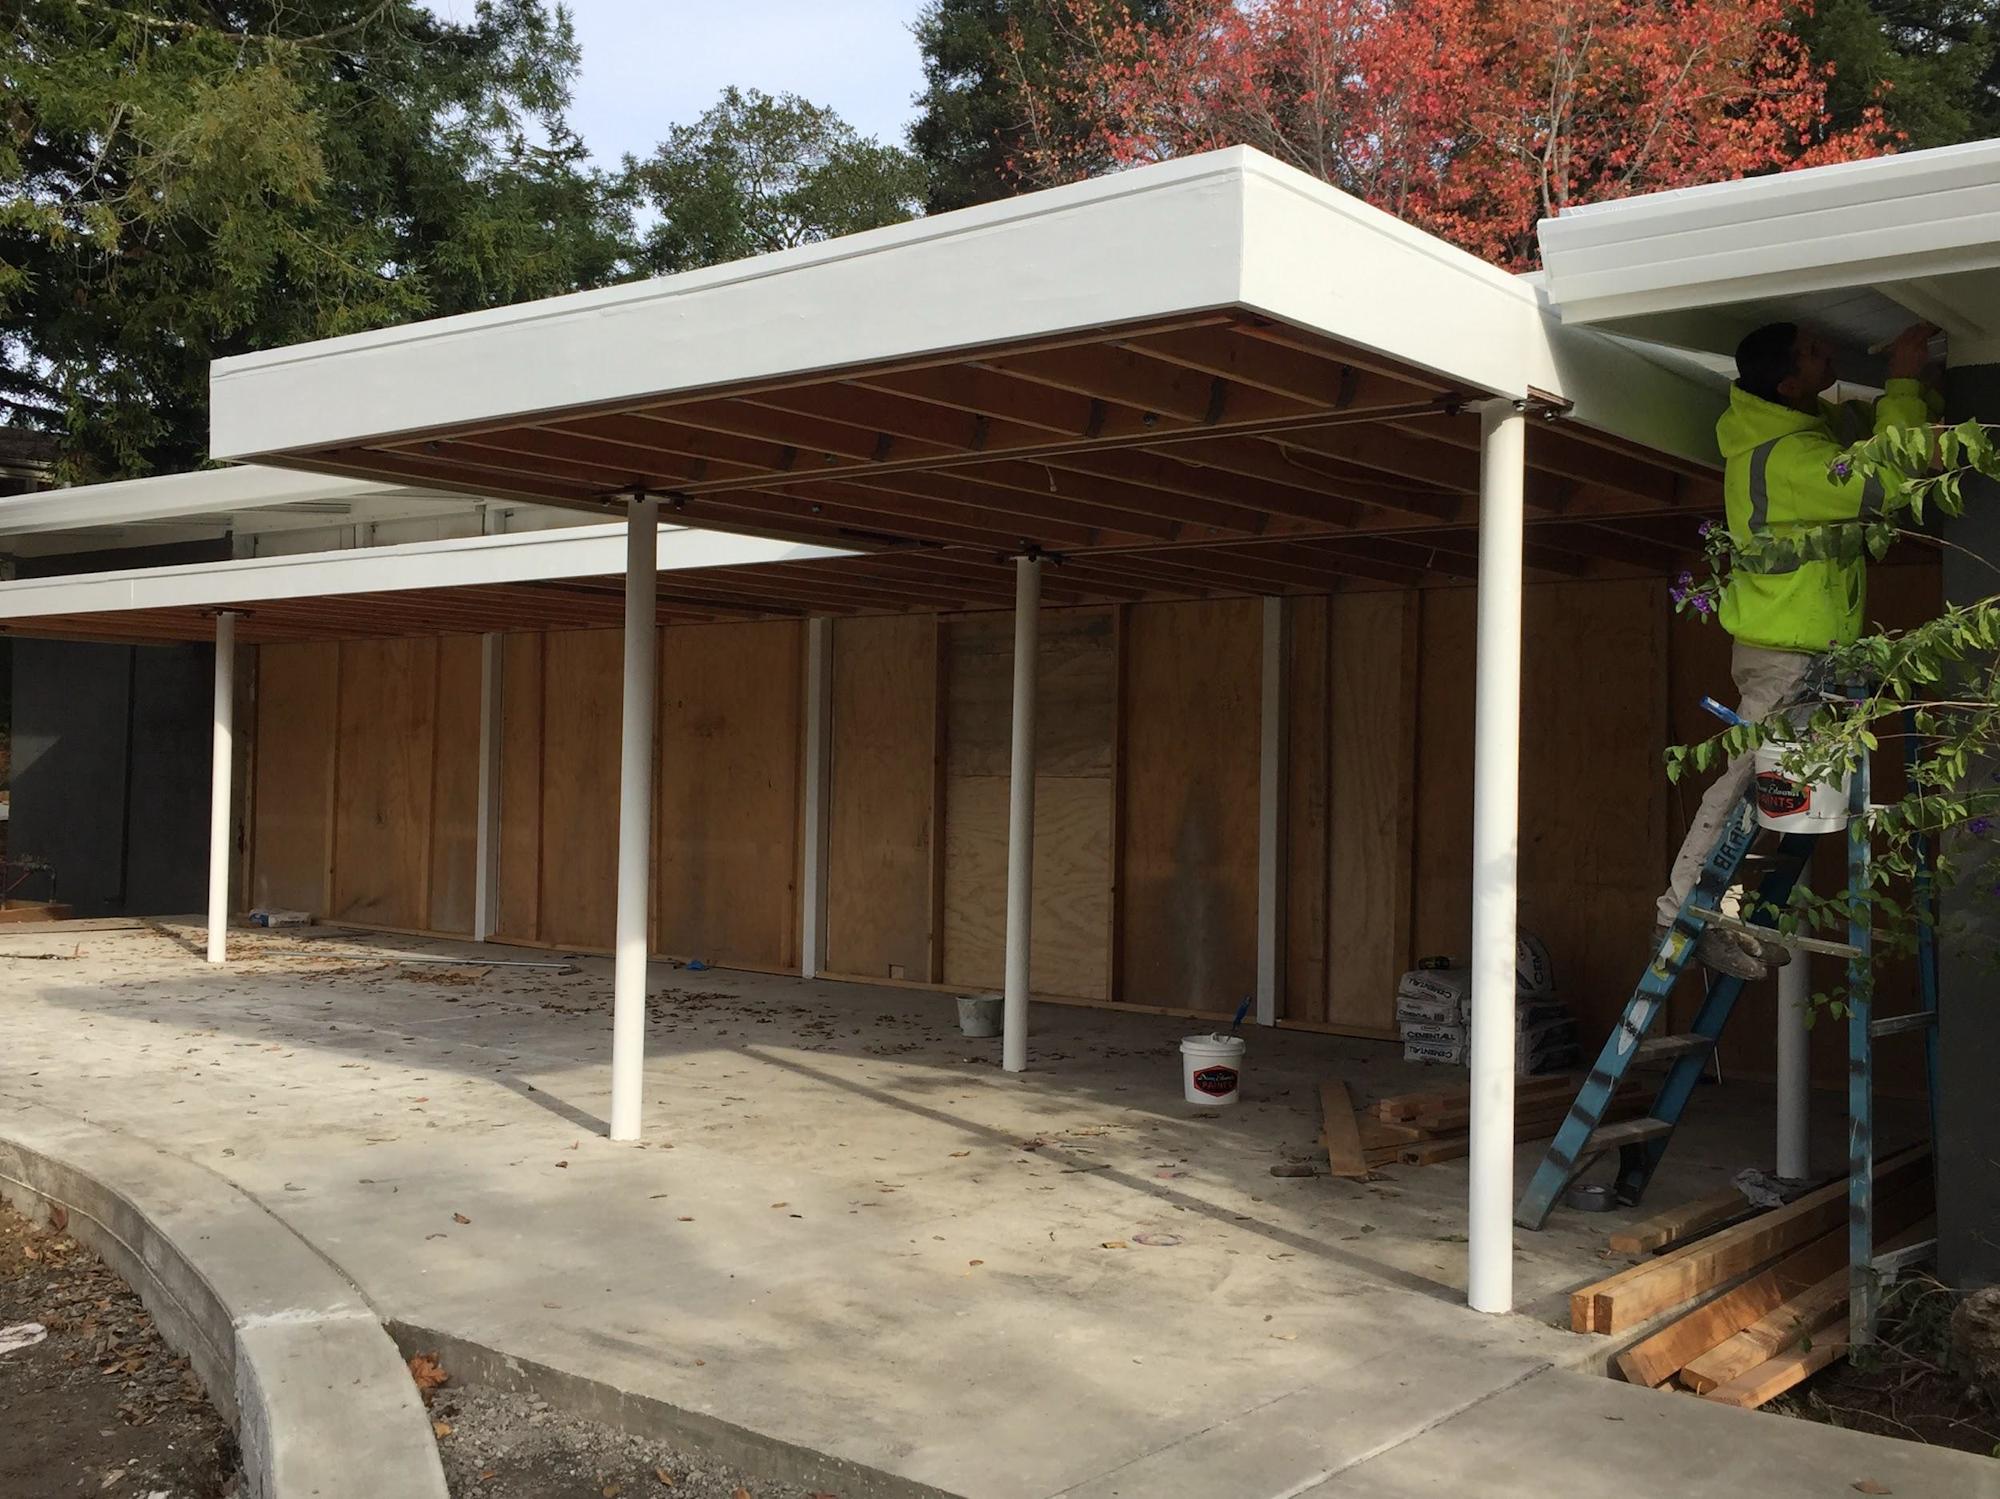 May contain: patio, porch, and pergola